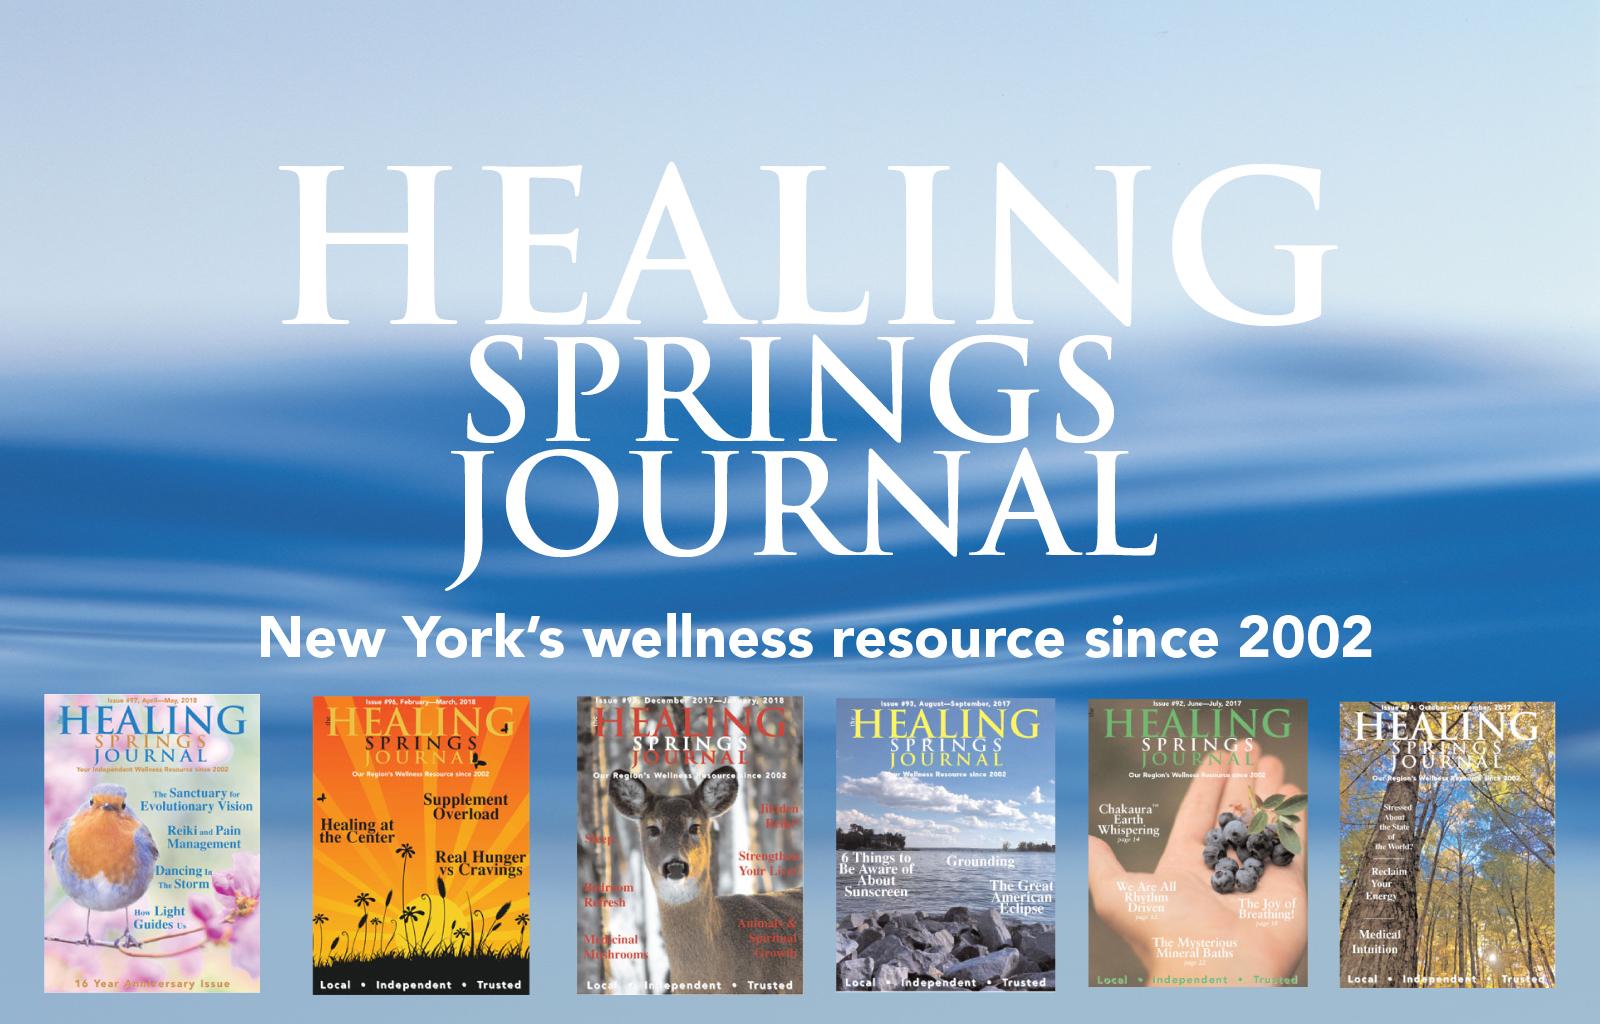 The Healing Springs Journal